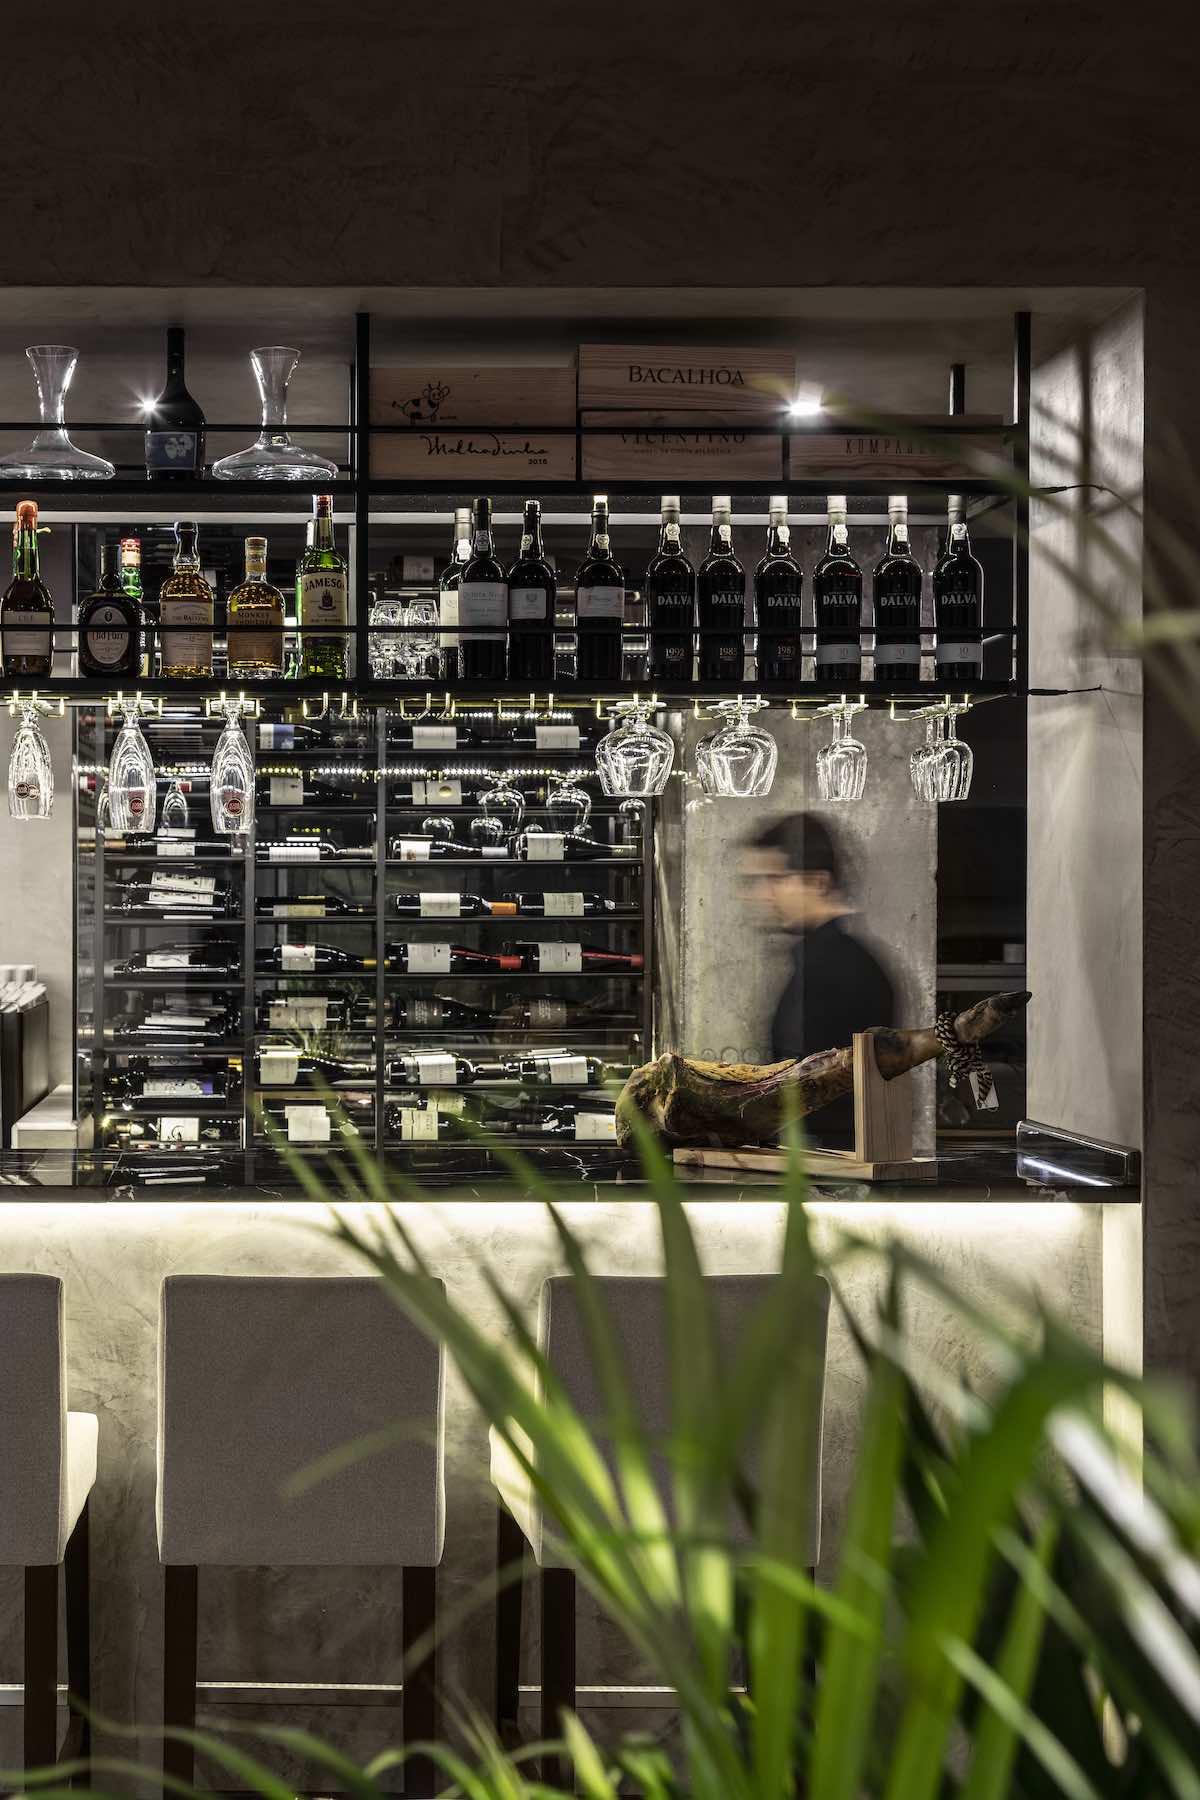 FAMA_Restaurant_Paulo_Martins_Arquitectura_and_design_AmazingArchitecture_%20013.jpg